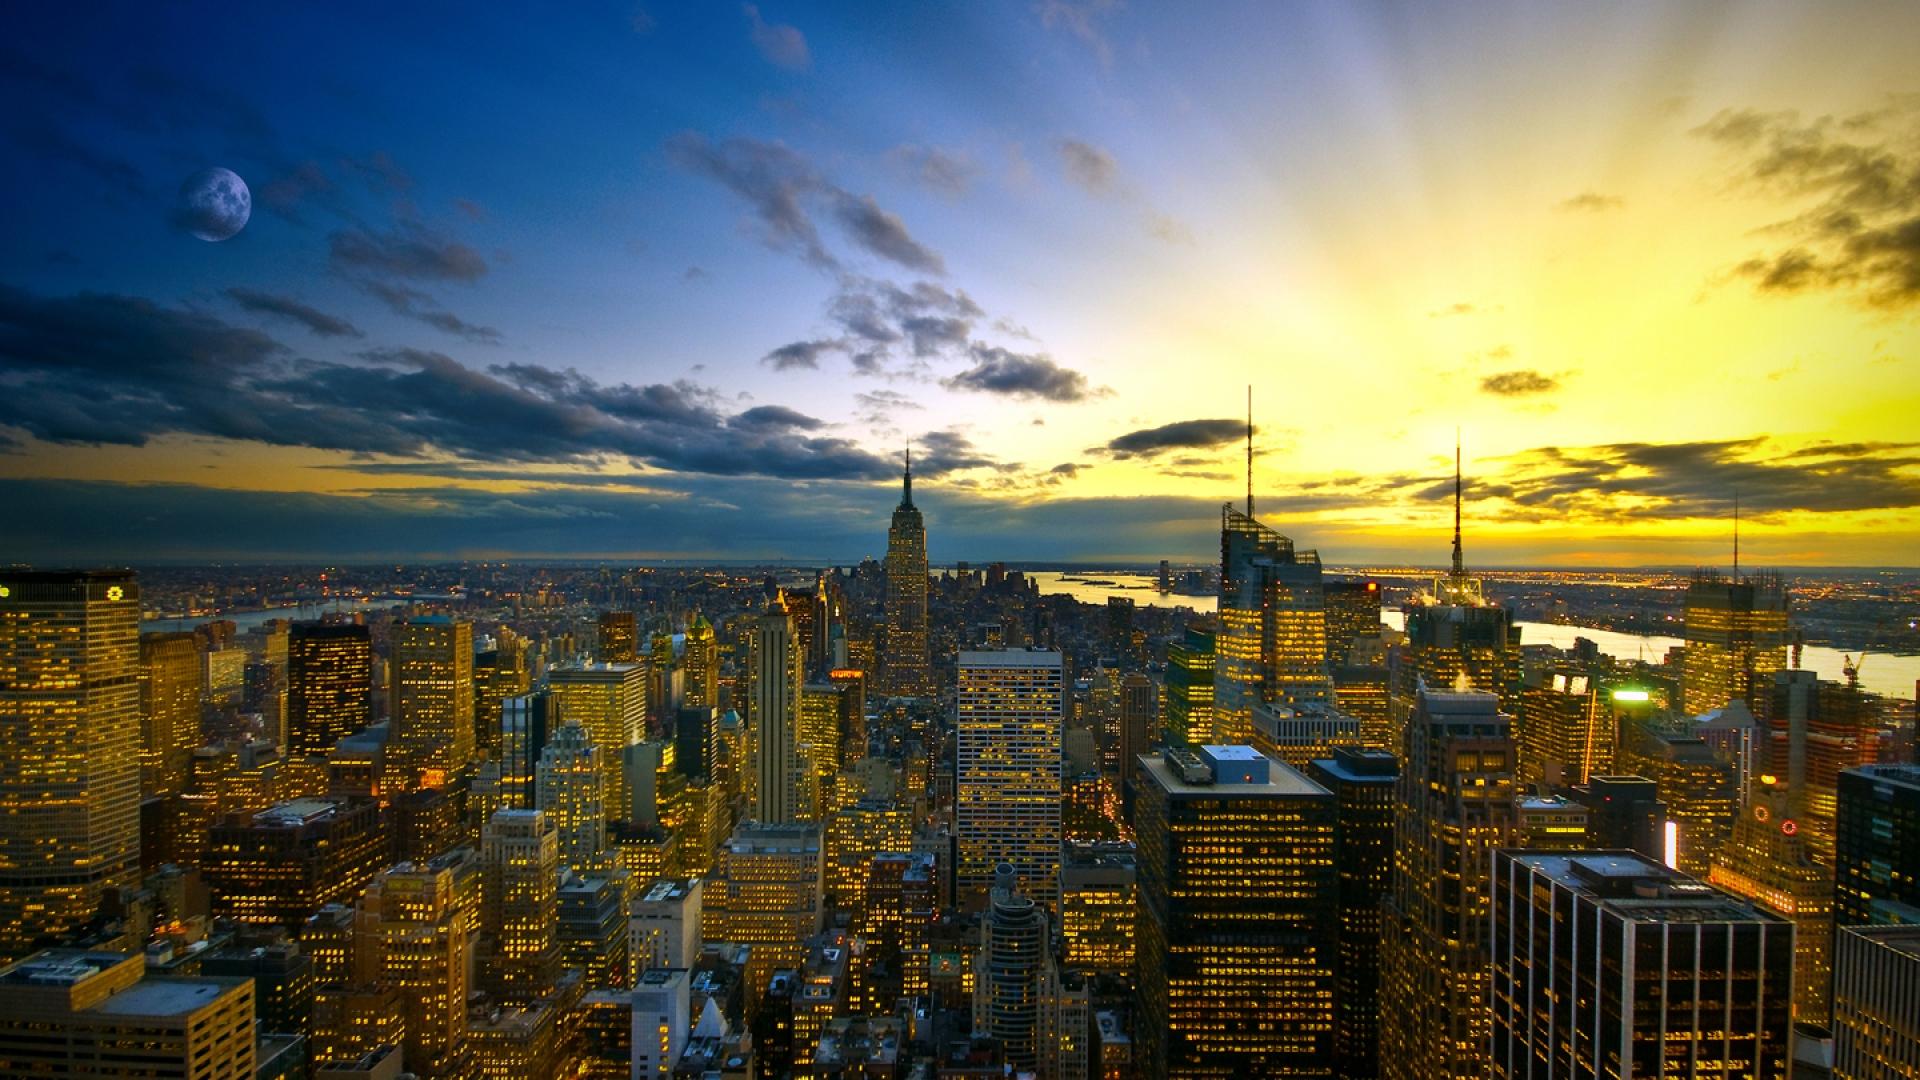 City Sunset Wallpaper